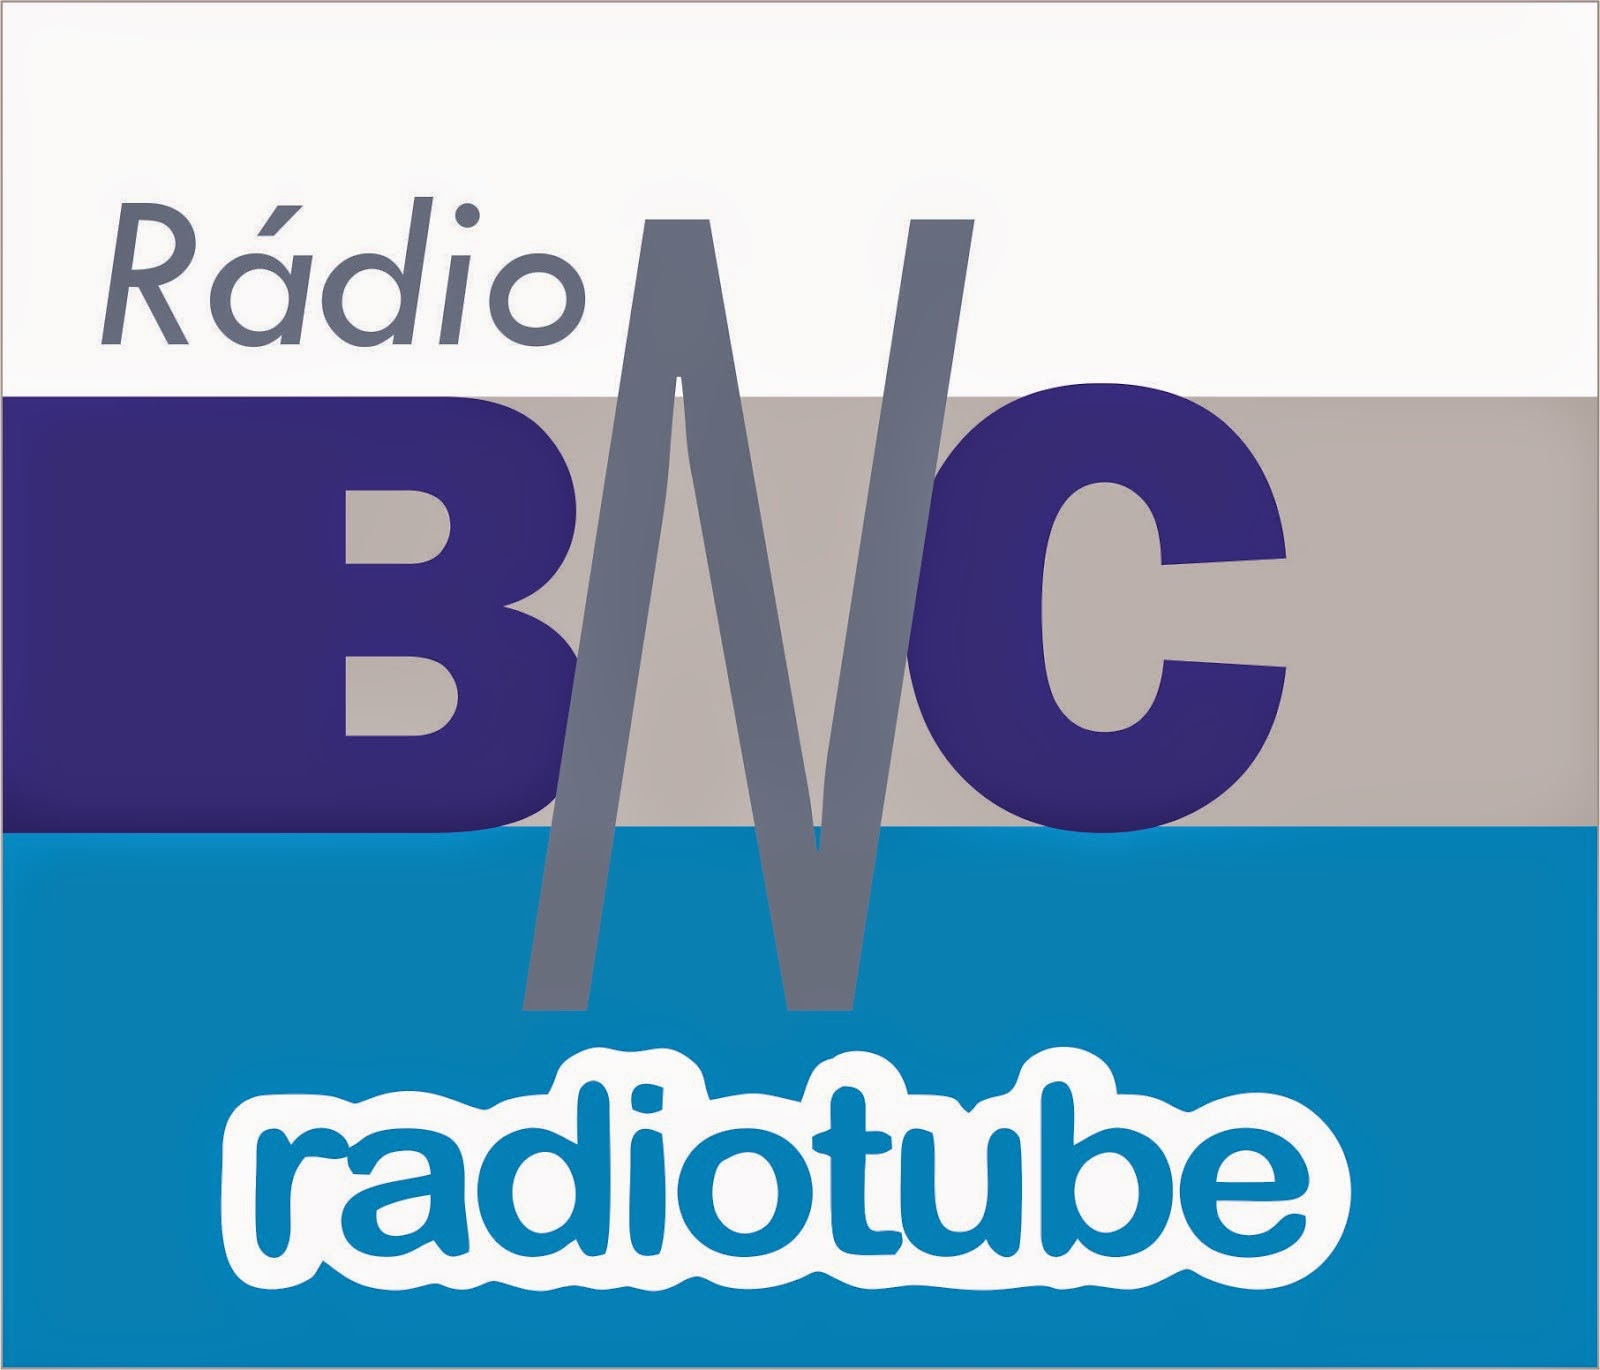 Rádio BNC/Radiotube